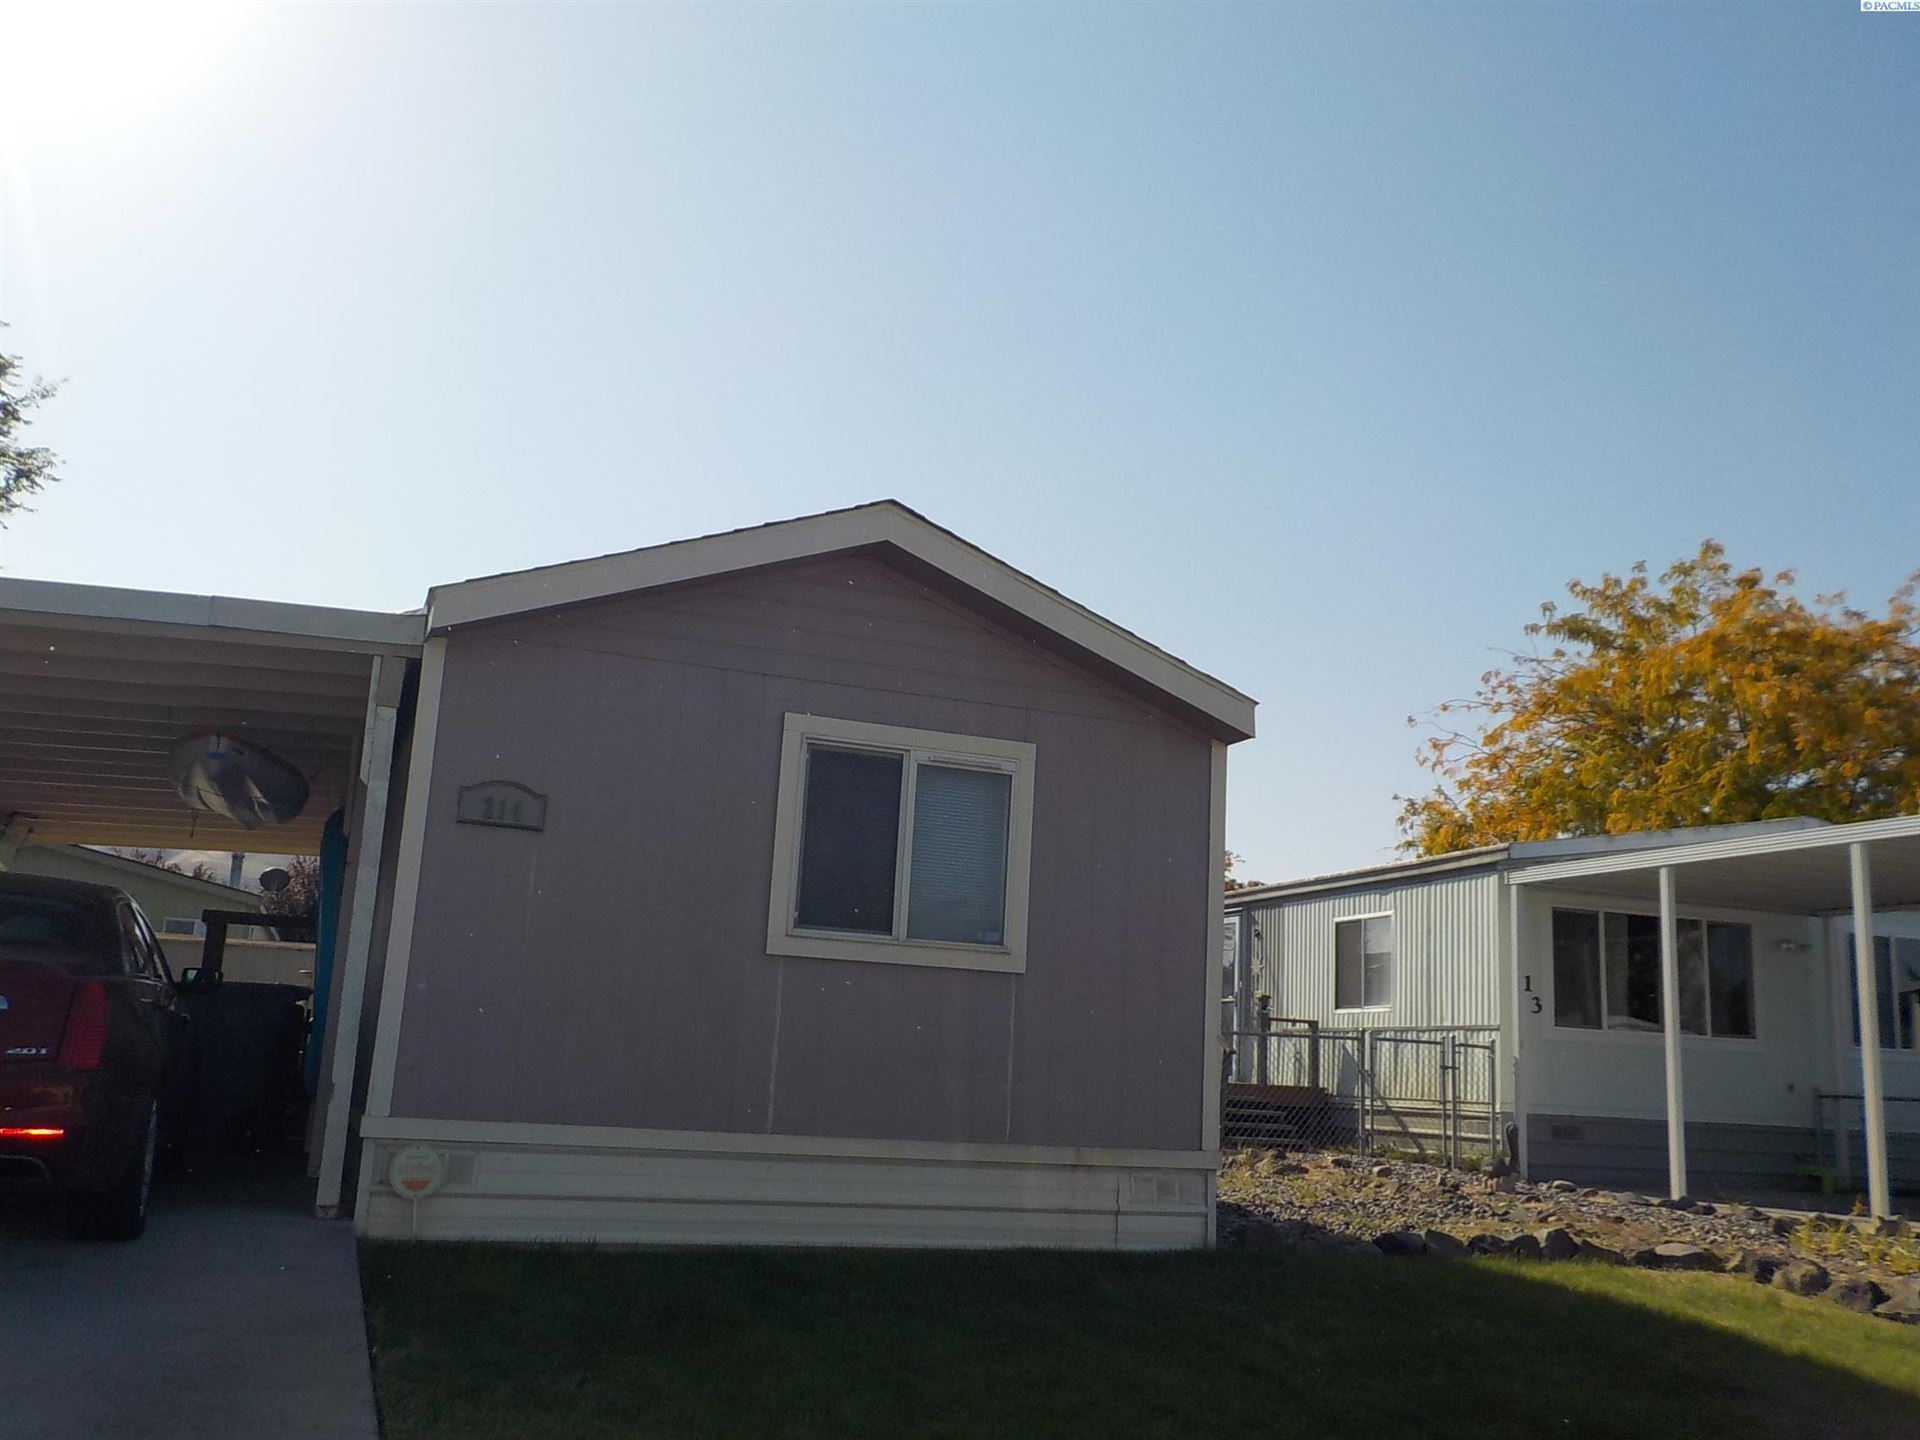 Photo of 214 Crestwood Drive, Richland, WA 99352 (MLS # 257313)